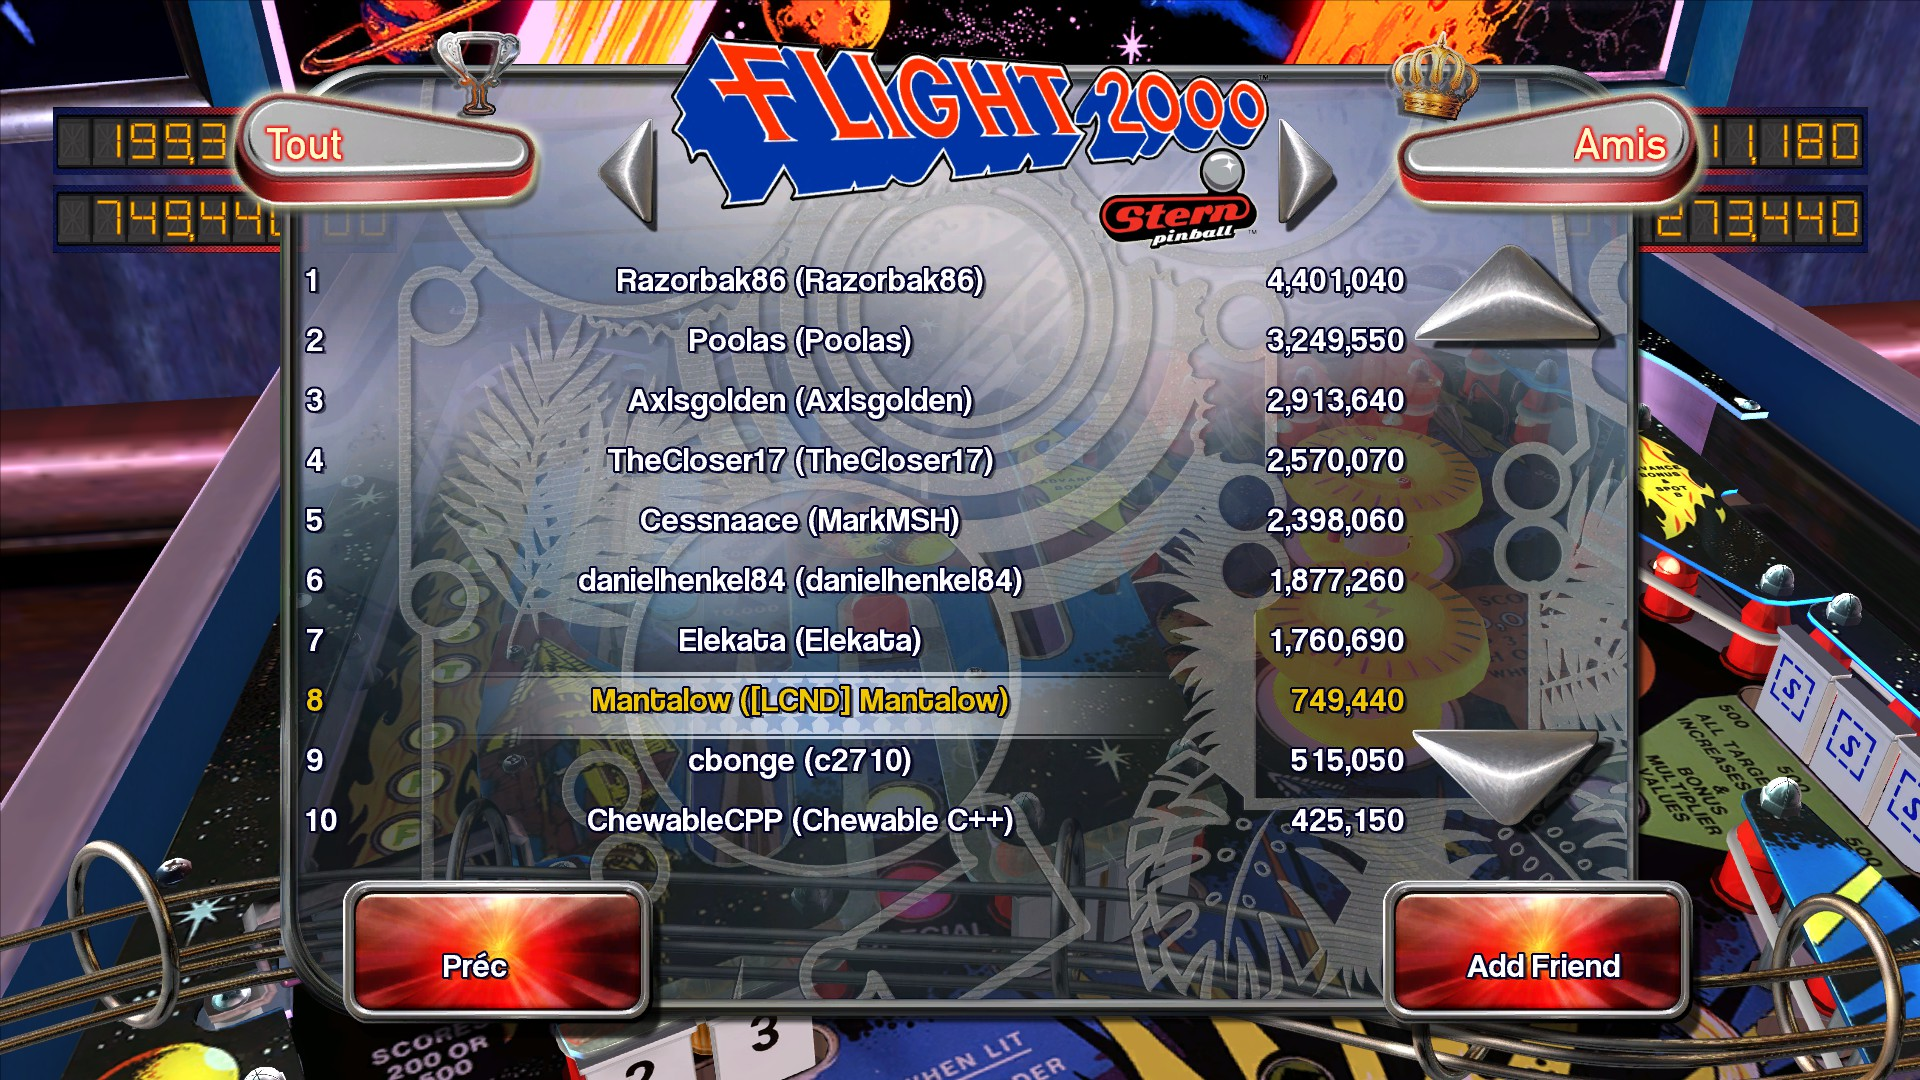 Mantalow: Pinball Arcade: Flight 2000 (PC) 749,440 points on 2015-08-28 04:49:52